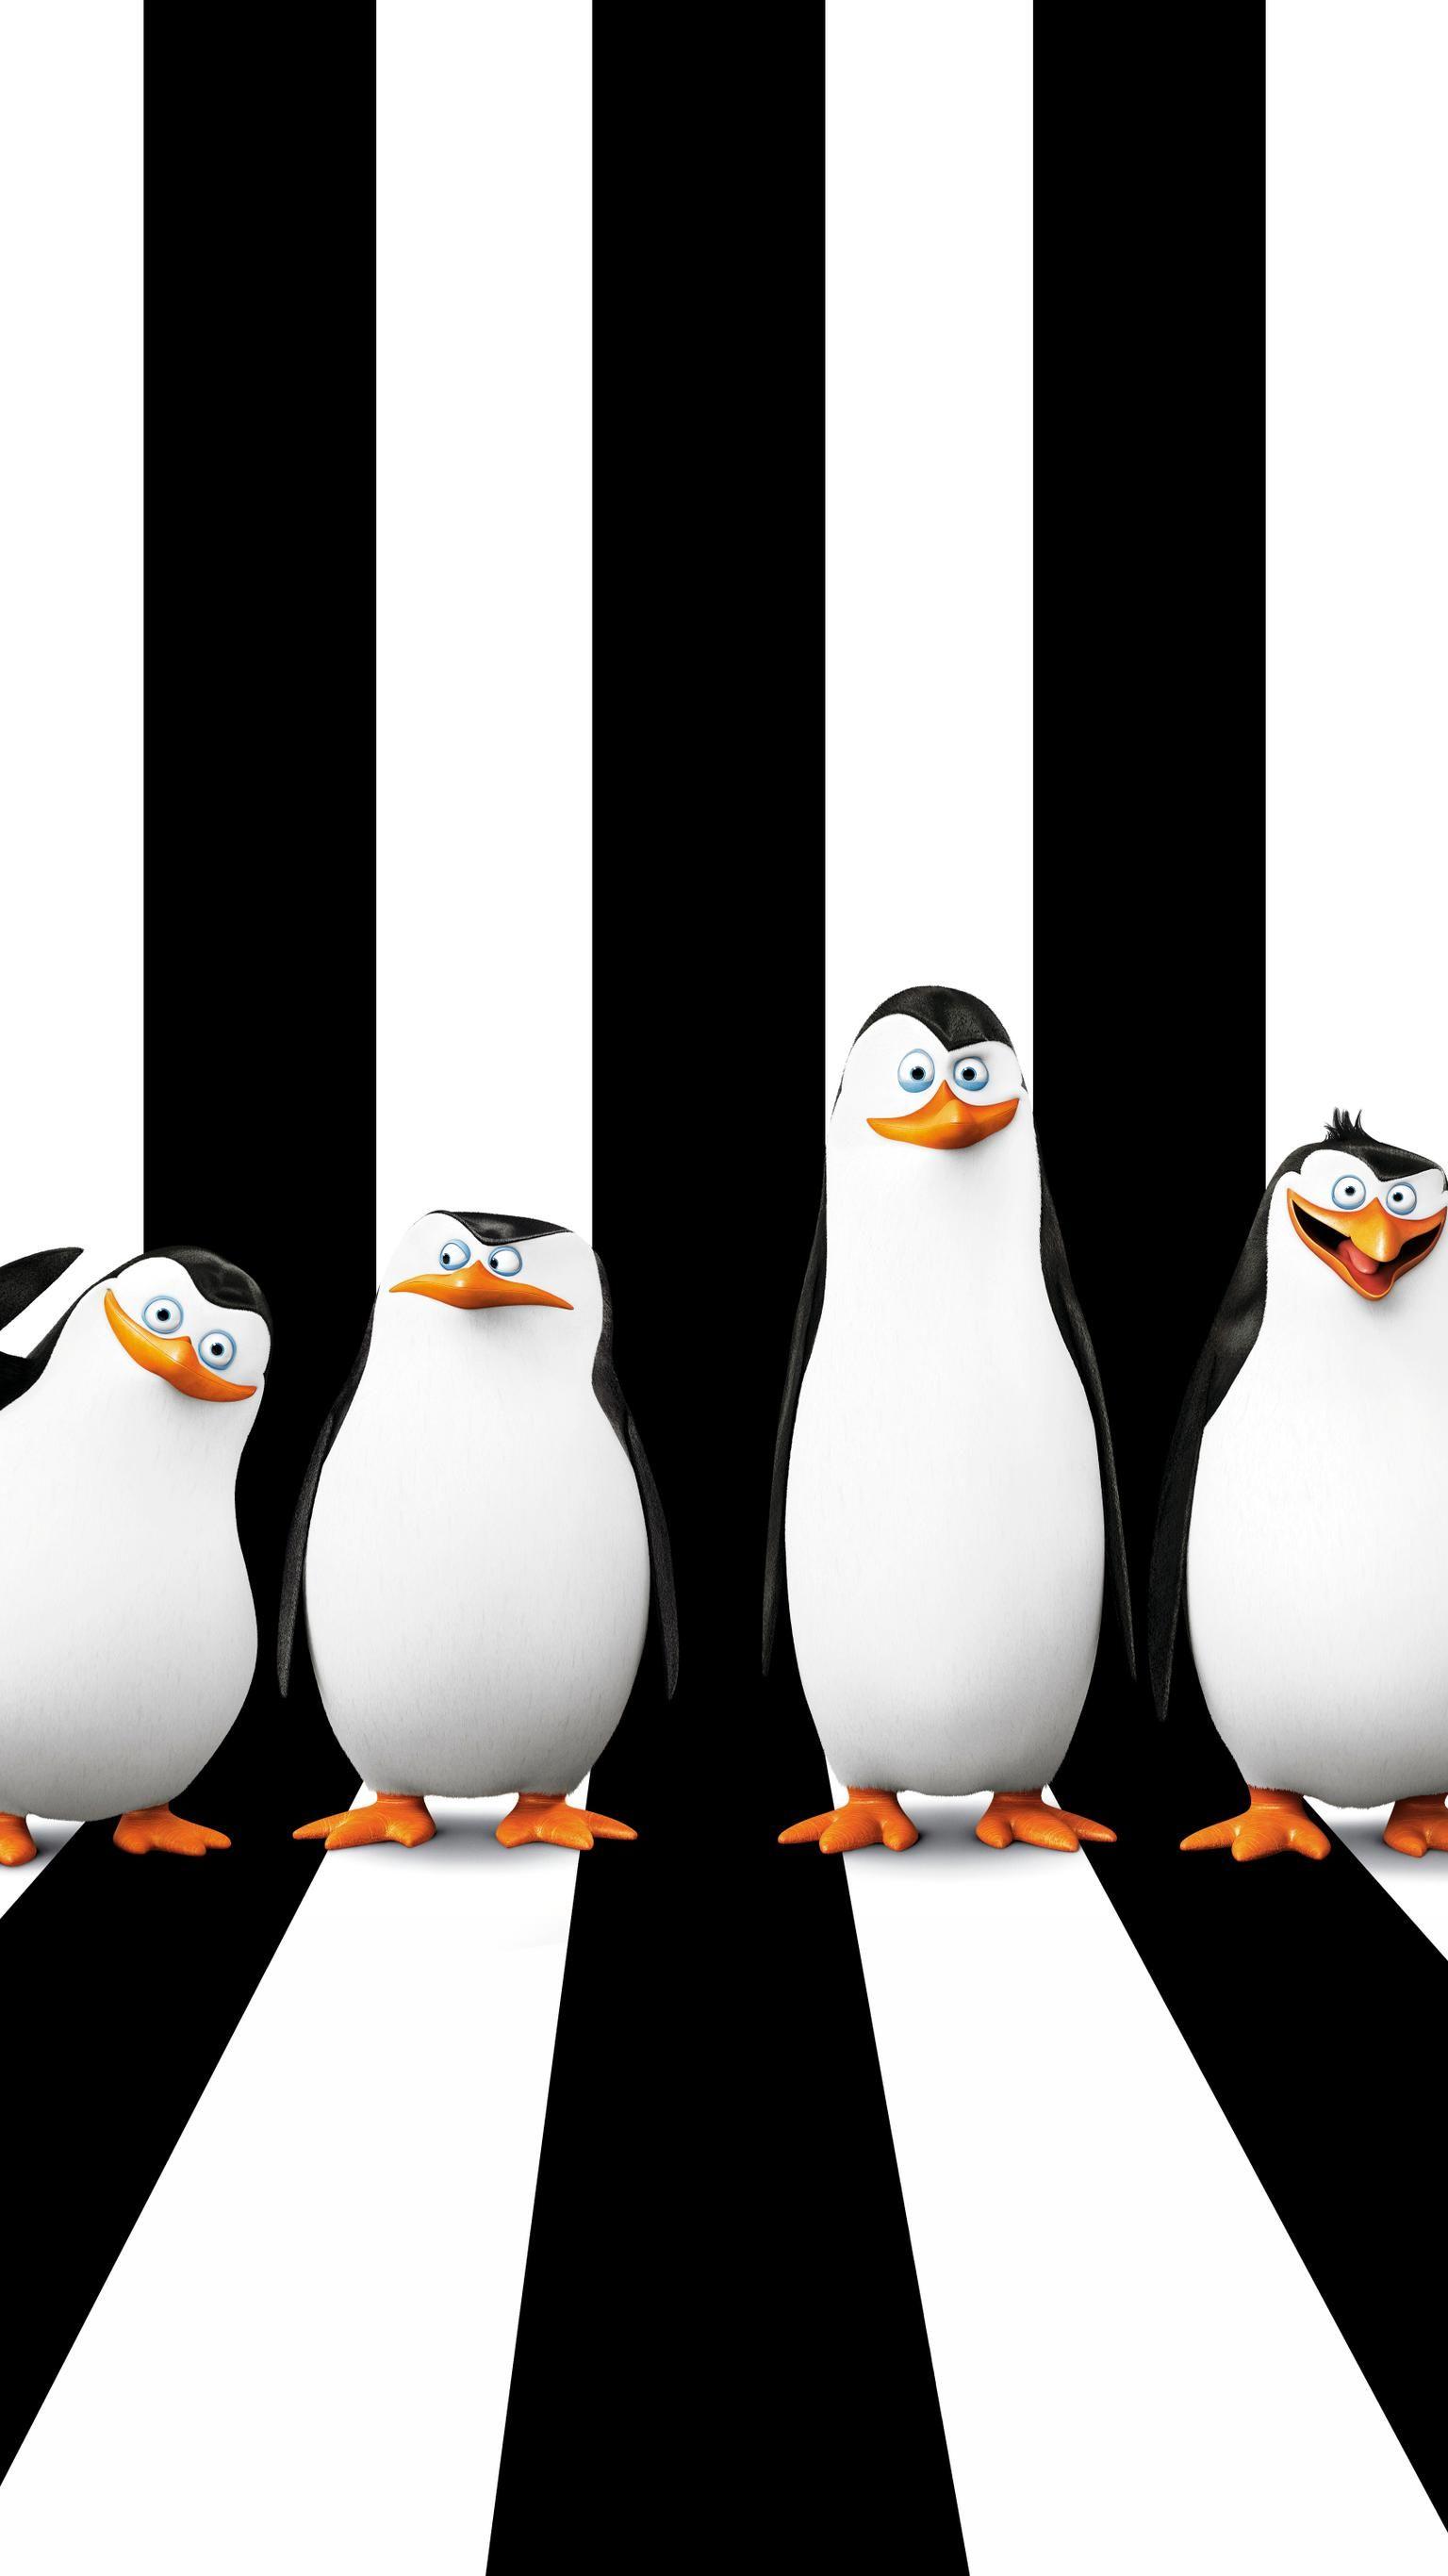 Penguins of Madagascar (2014) Phone Wallpaper | Moviemania